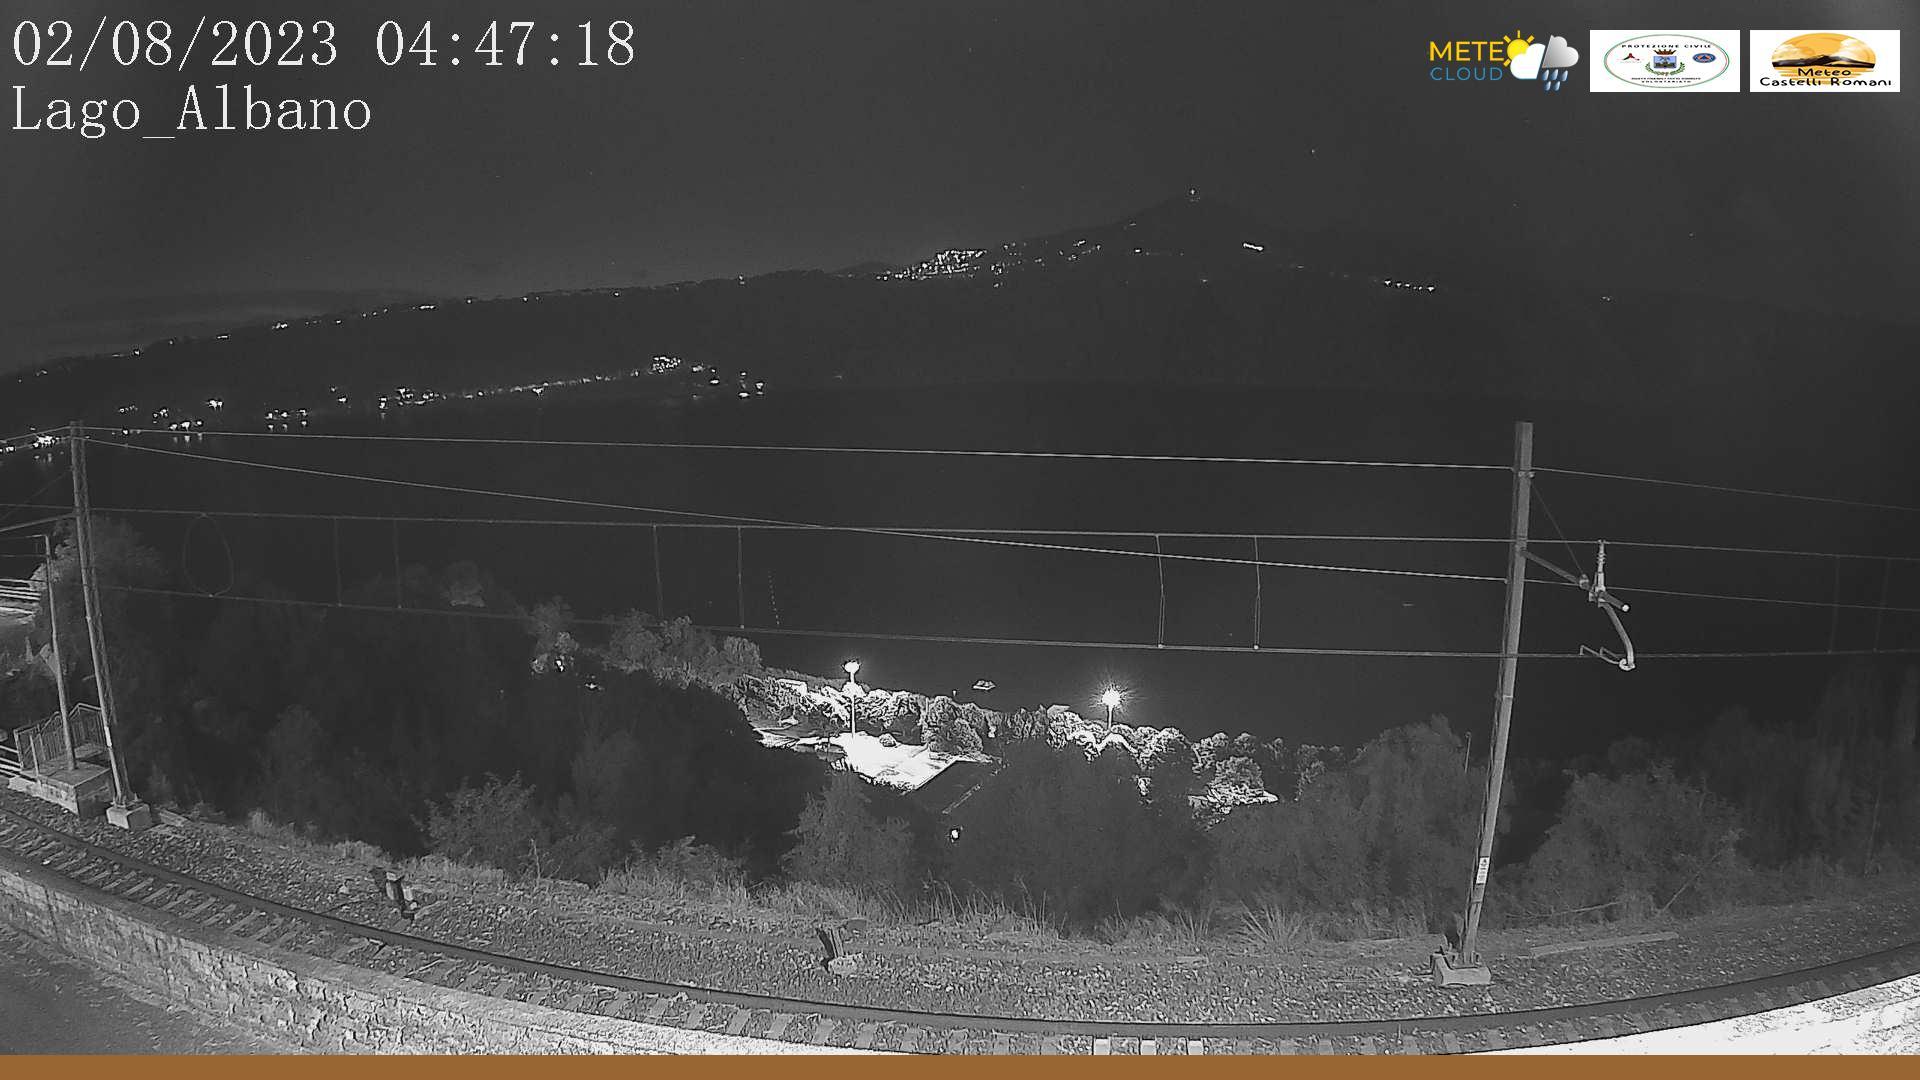 Webcam Castel Gandolfo › North-East: Lake Albano − Monte